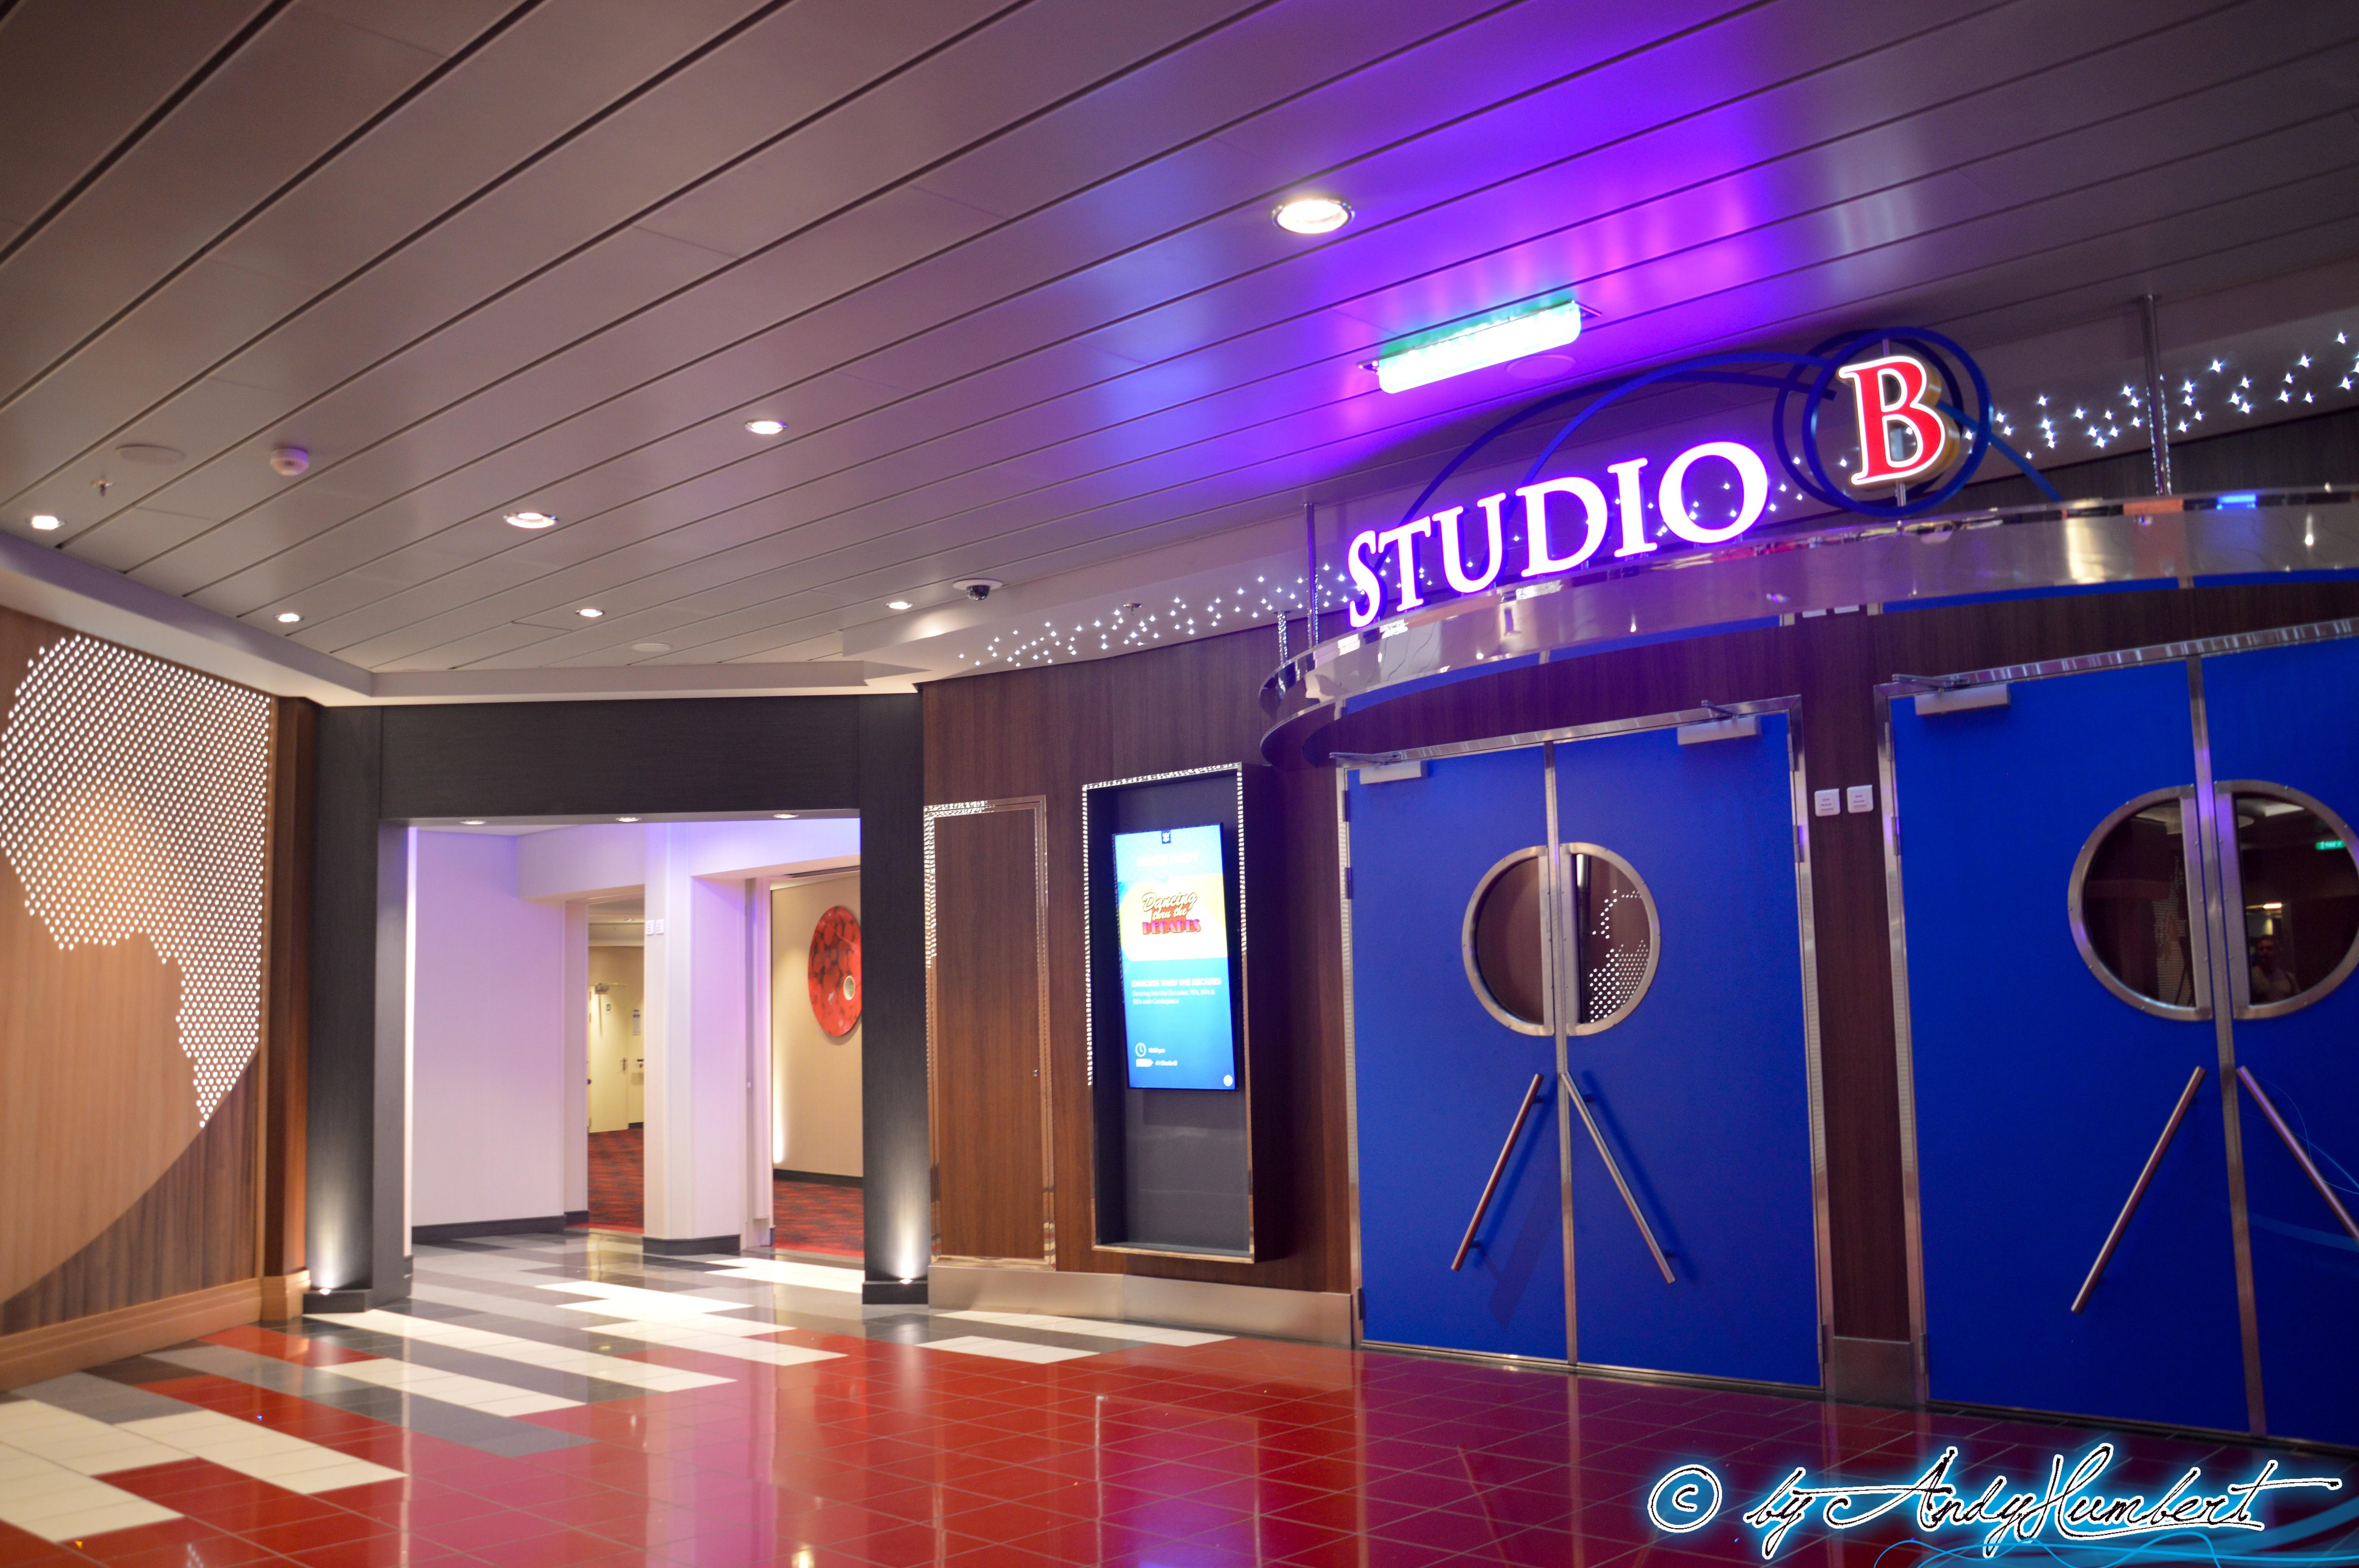 Studio B (ponts 3 & 4)